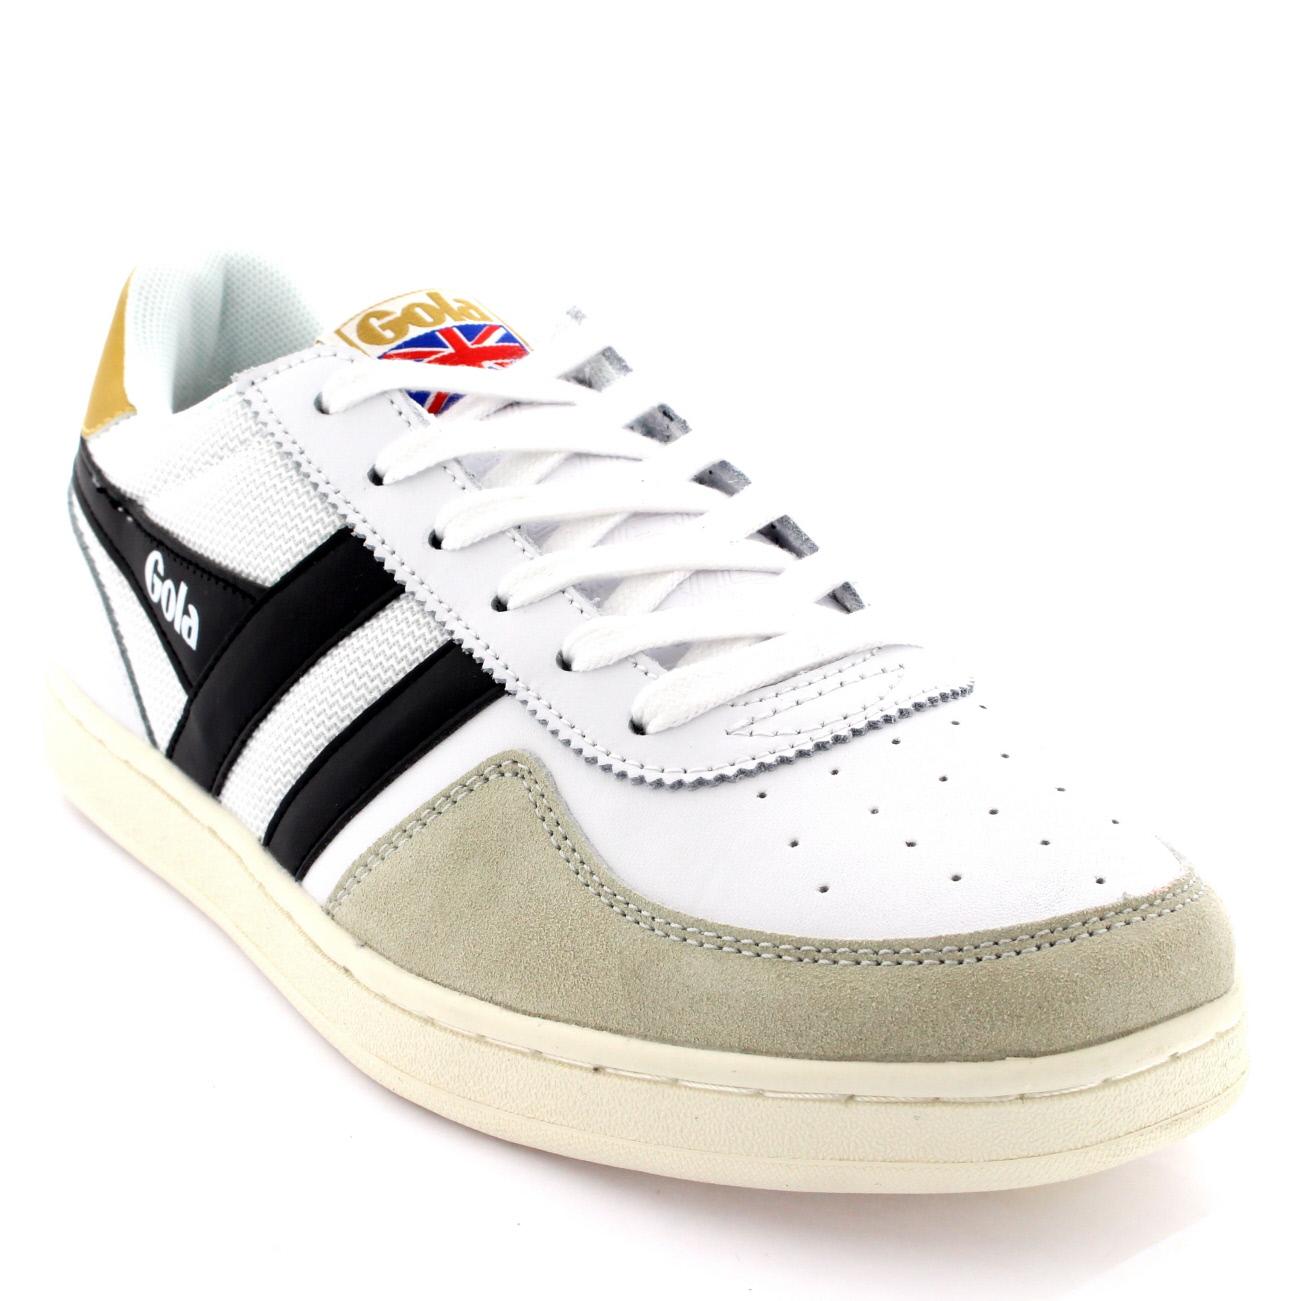 FOOTWEAR - Low-tops & sneakers Gola 5lDDKZAH